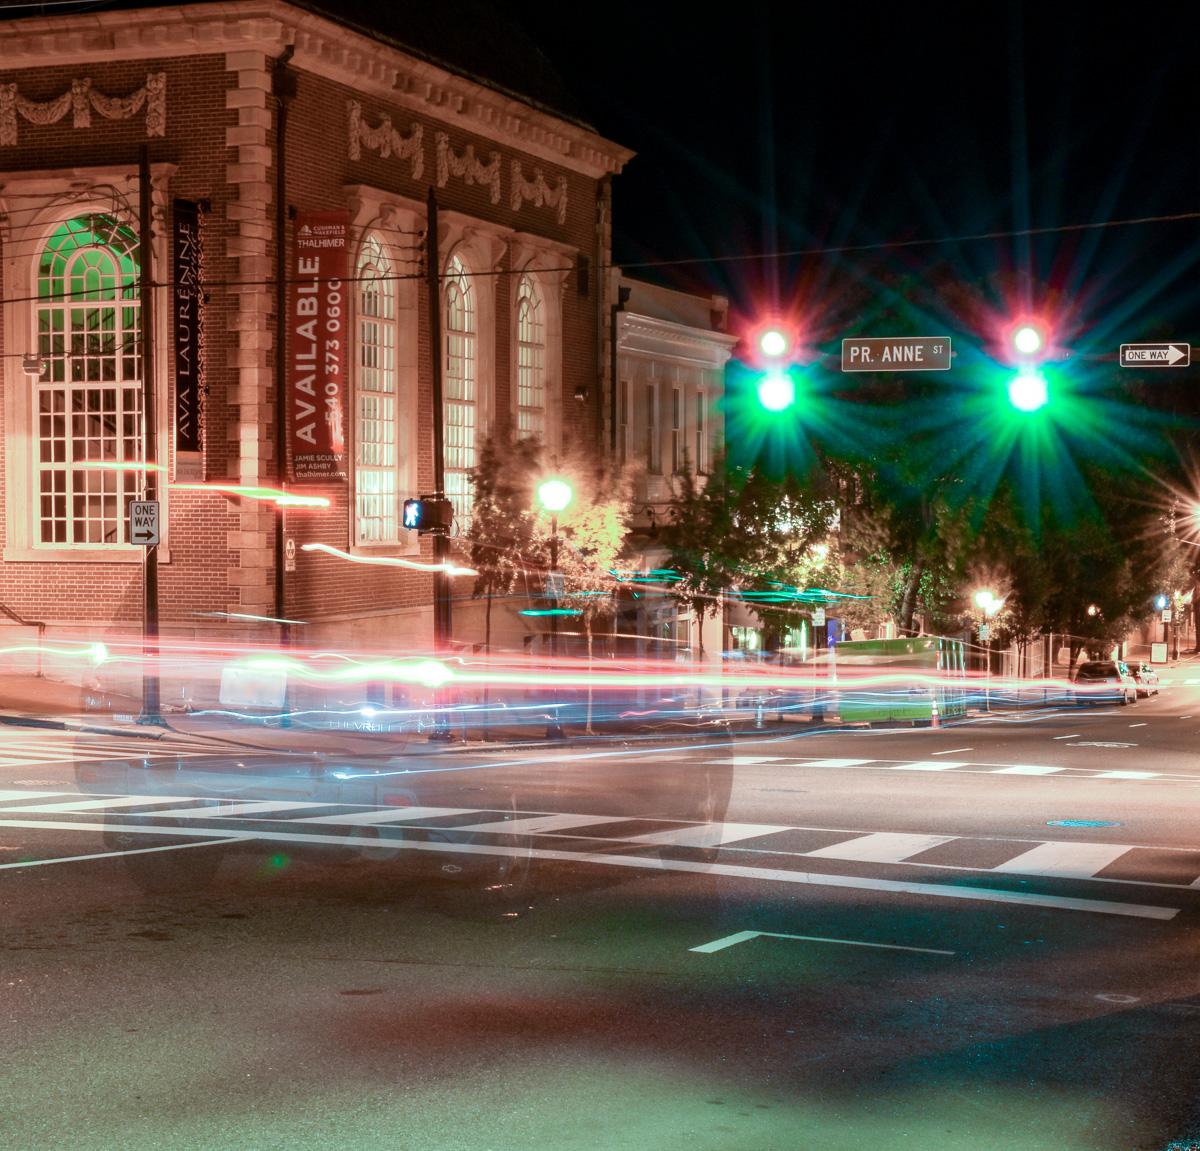 Corner of William and Princess Anne in Downtown Fredericksburg